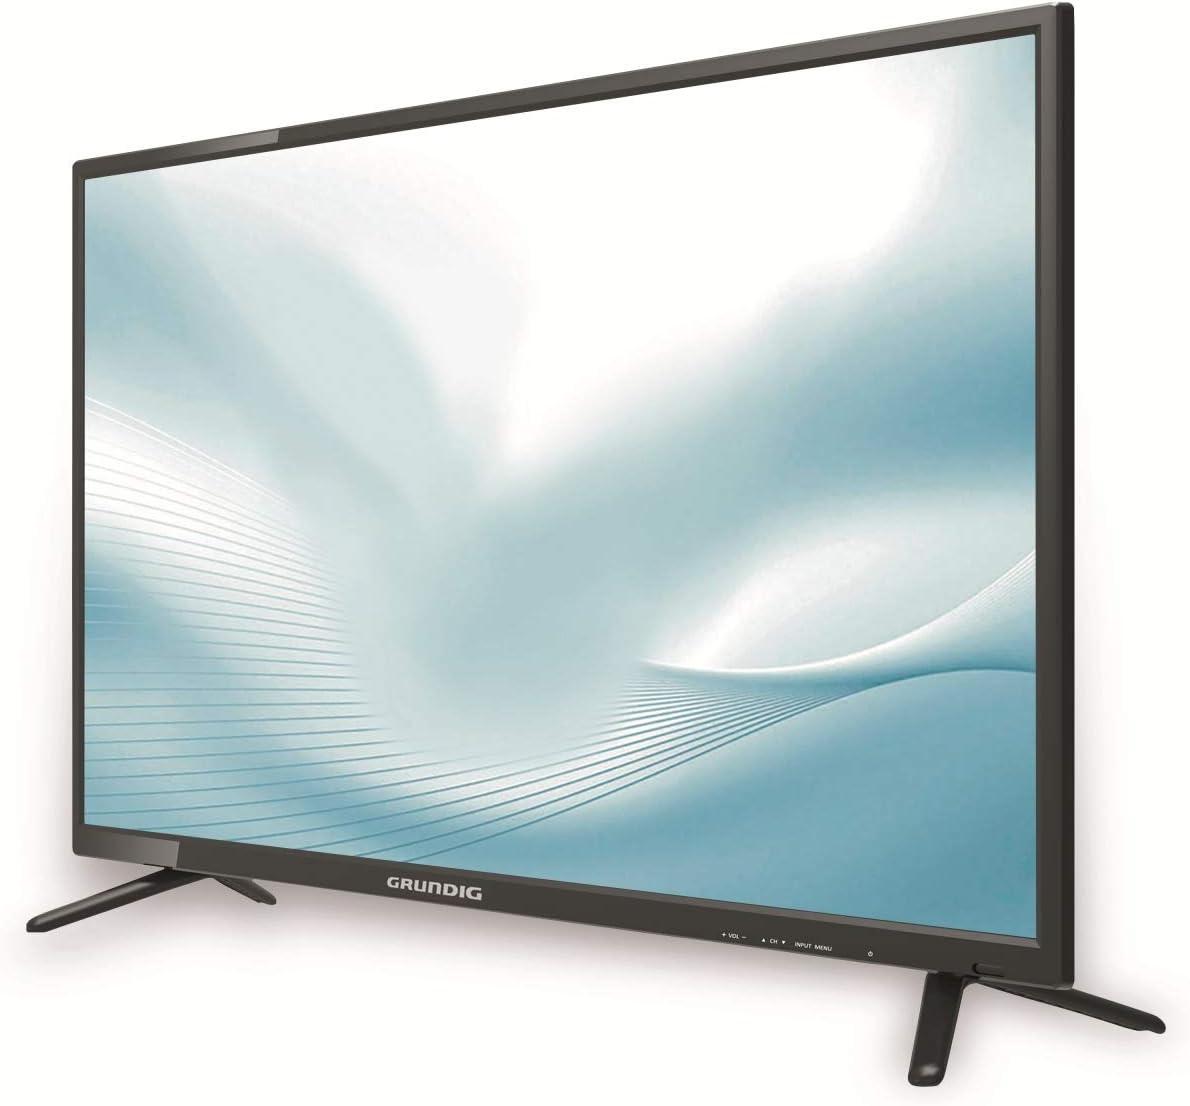 LED-TV GRUNDIG 32GHB5946 - Televisor (80 cm, eficiencia energética ...